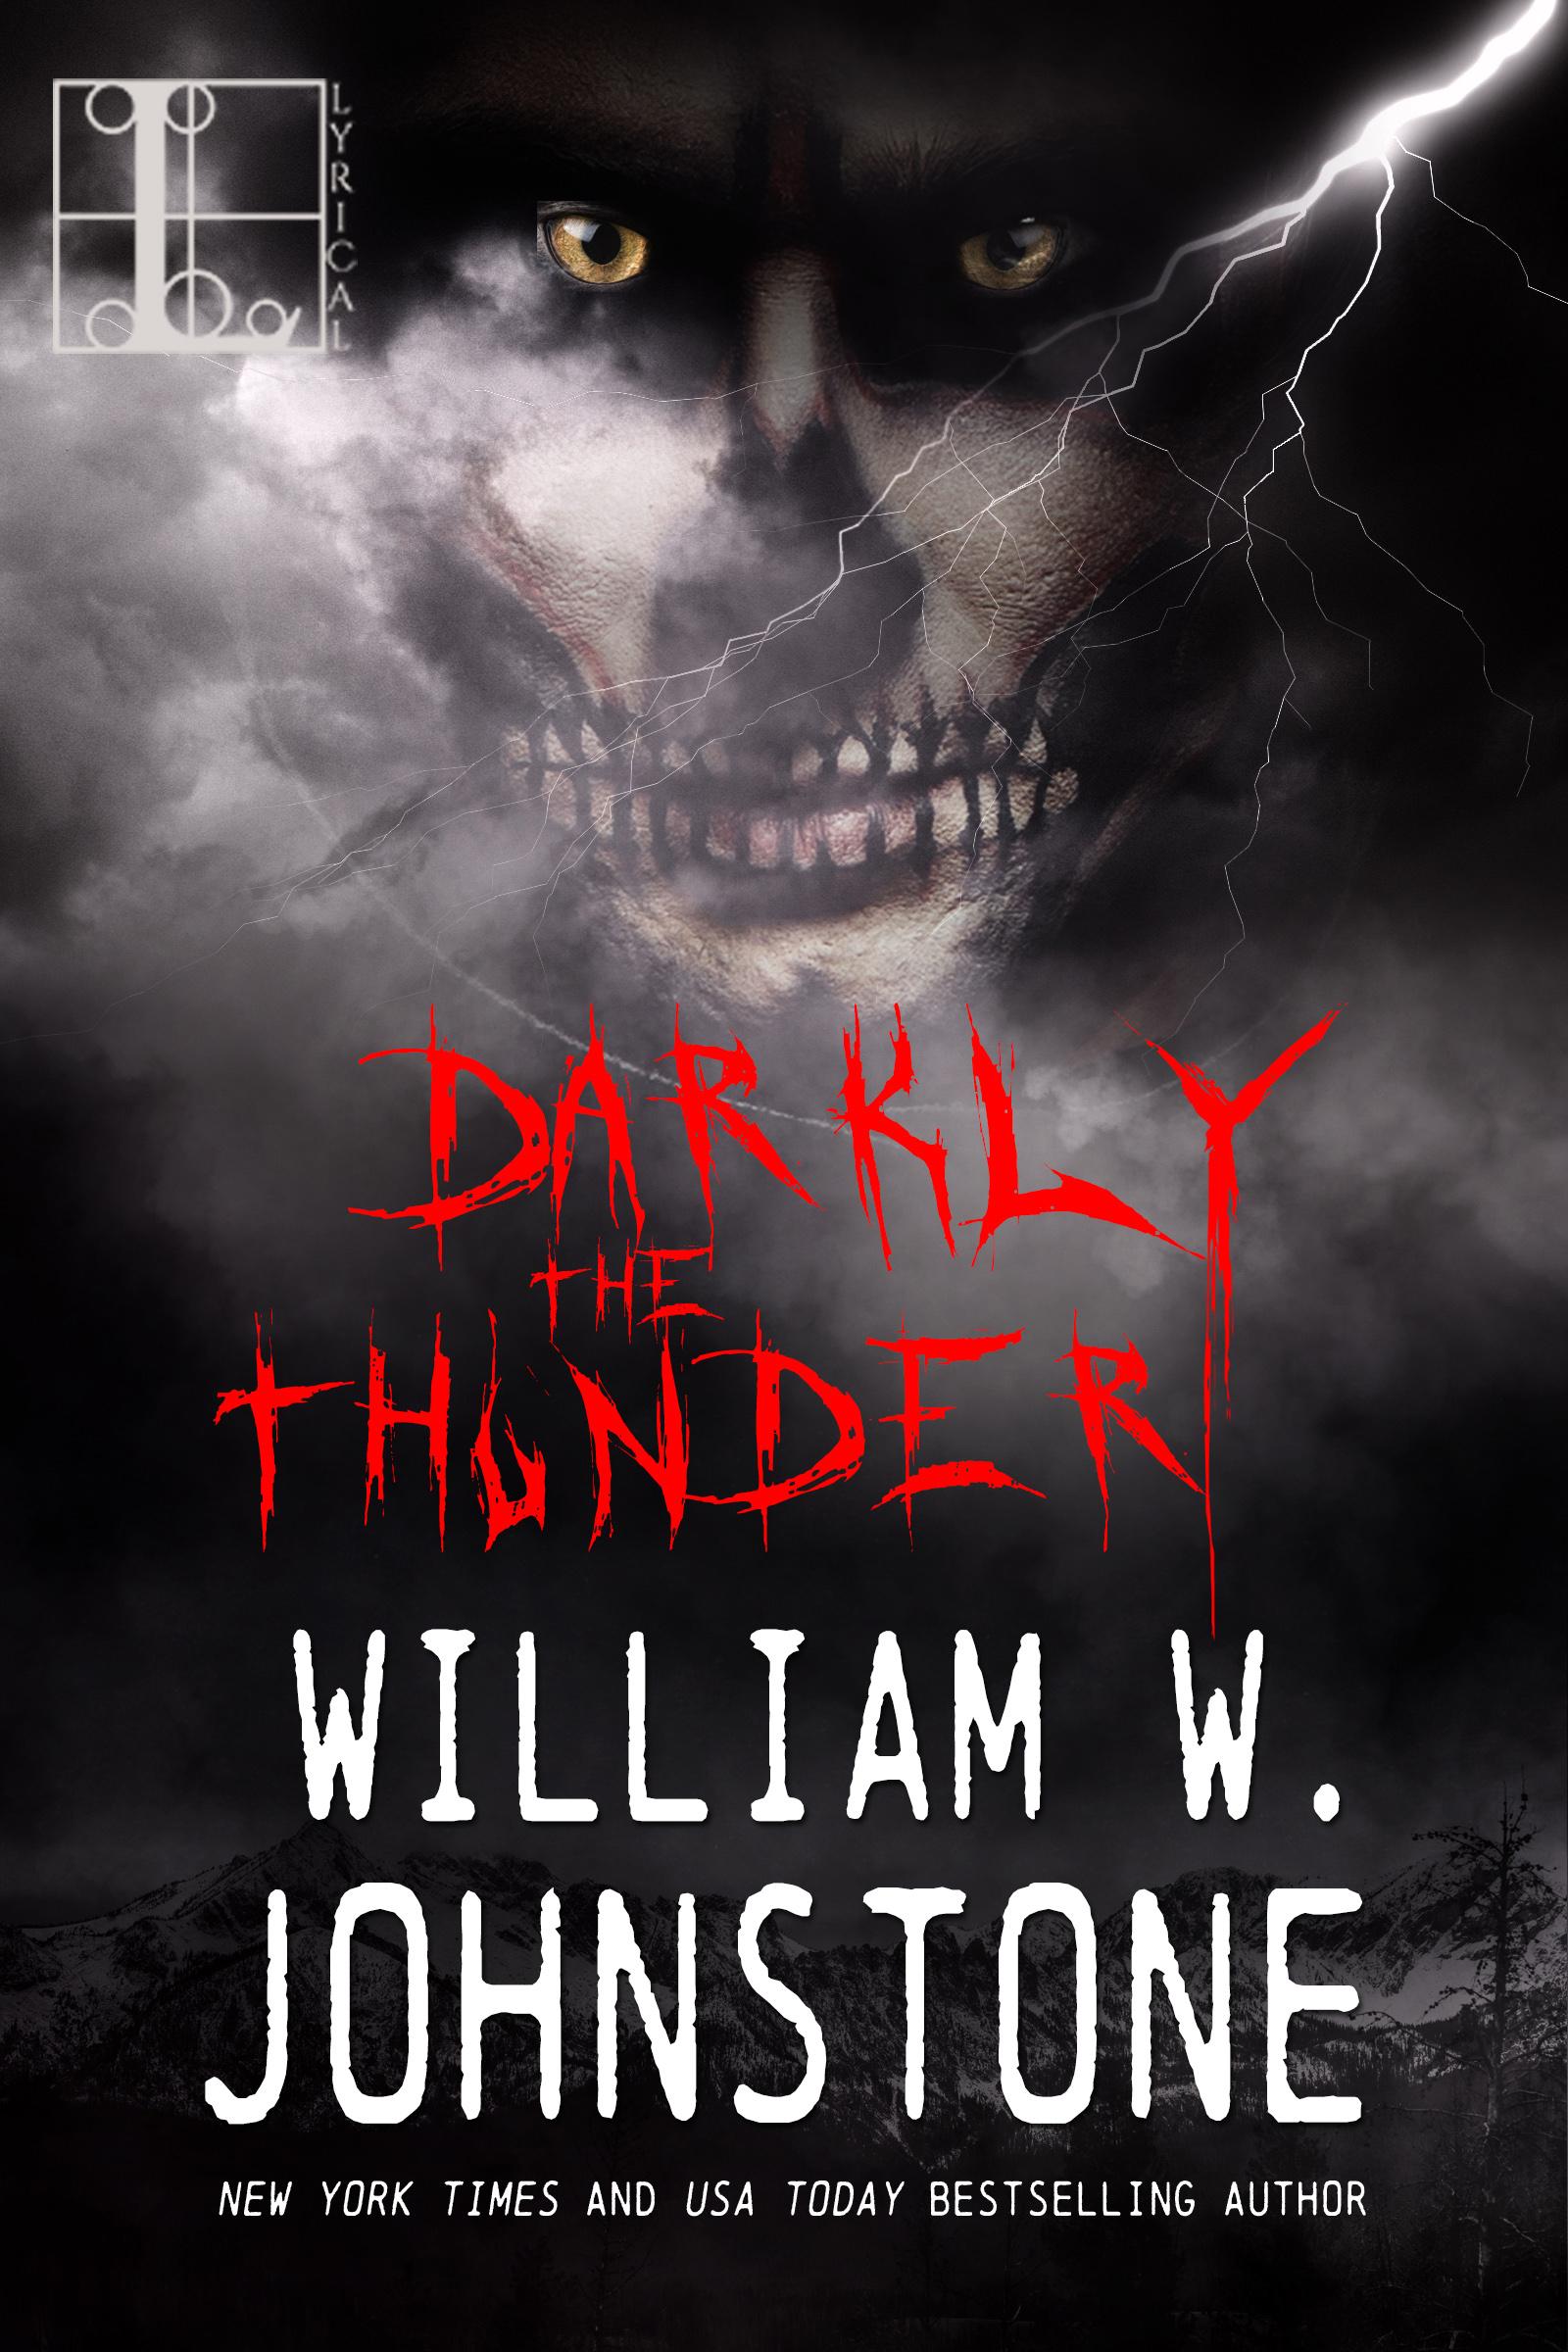 Darkly the thunder